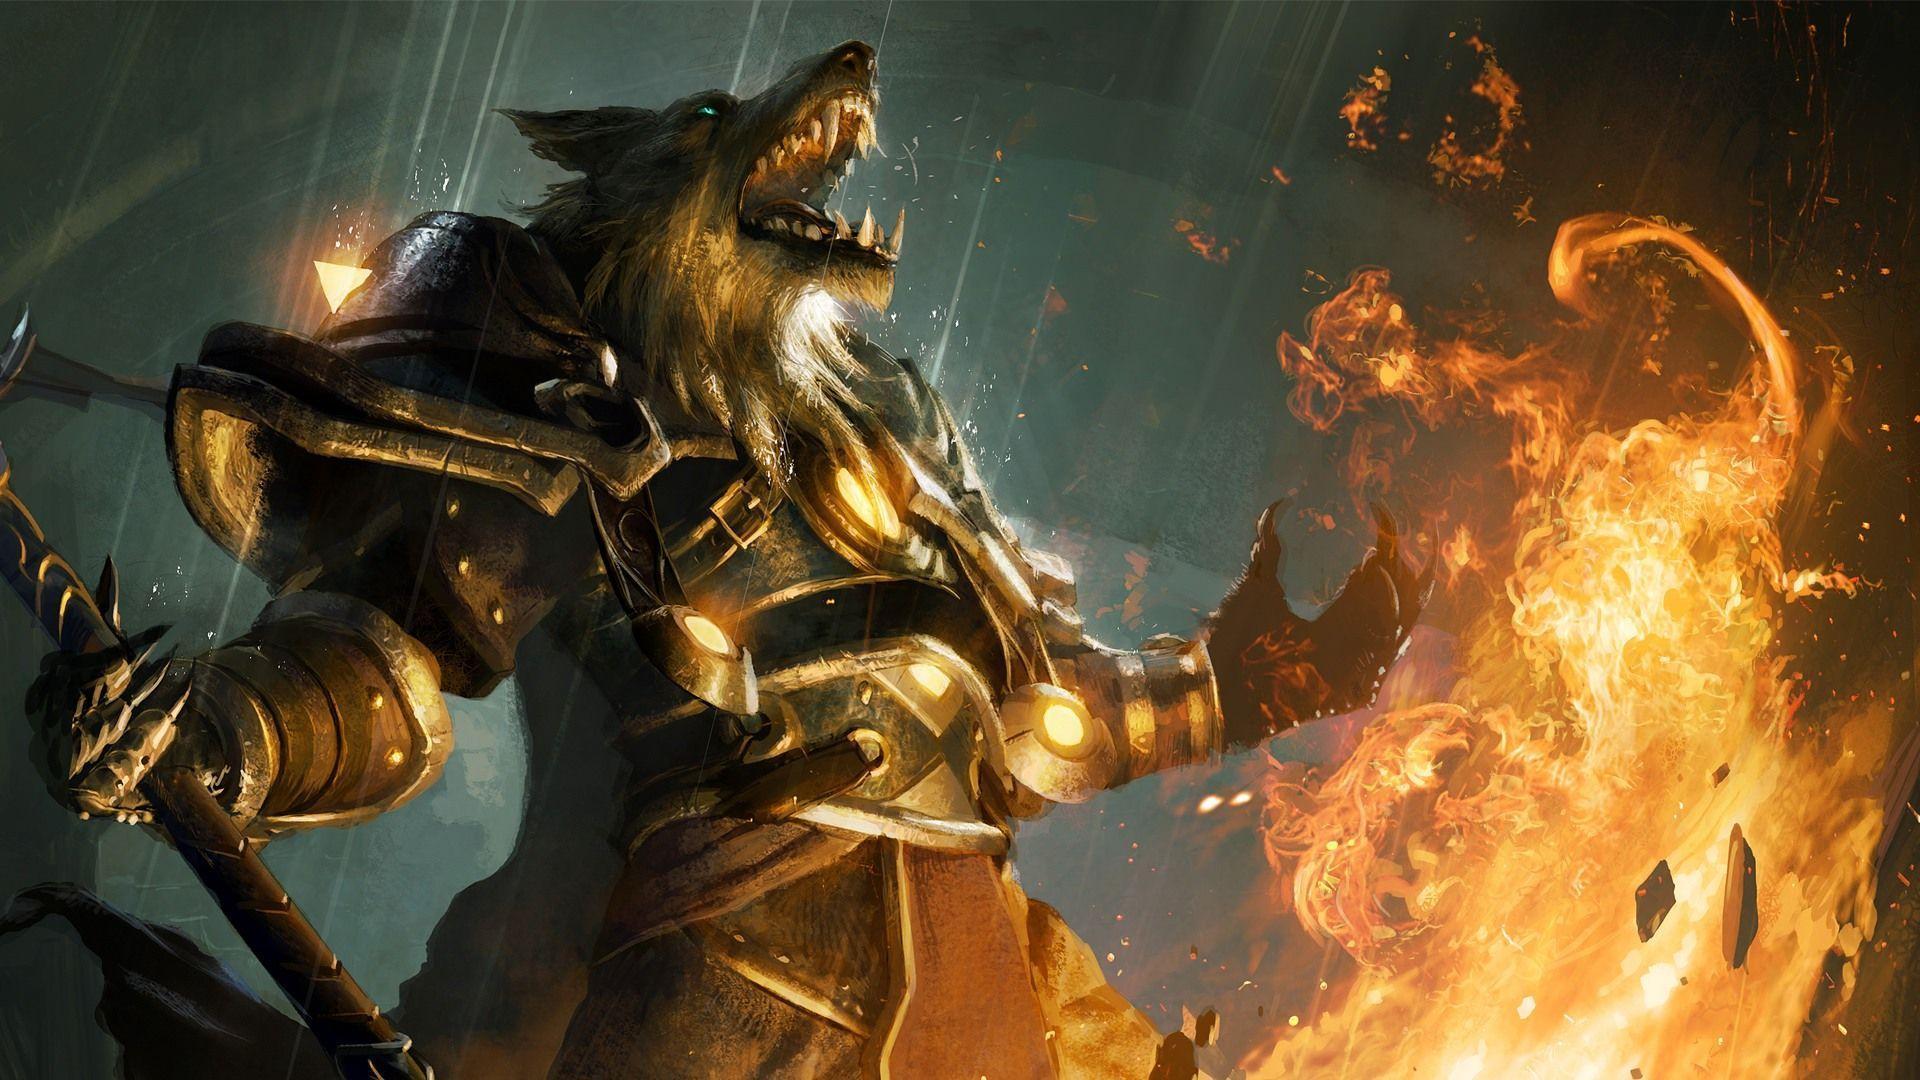 WoW Desktop Backgrounds - Wallpaper Cave  World Of Warcraft Cataclysm Wallpapers